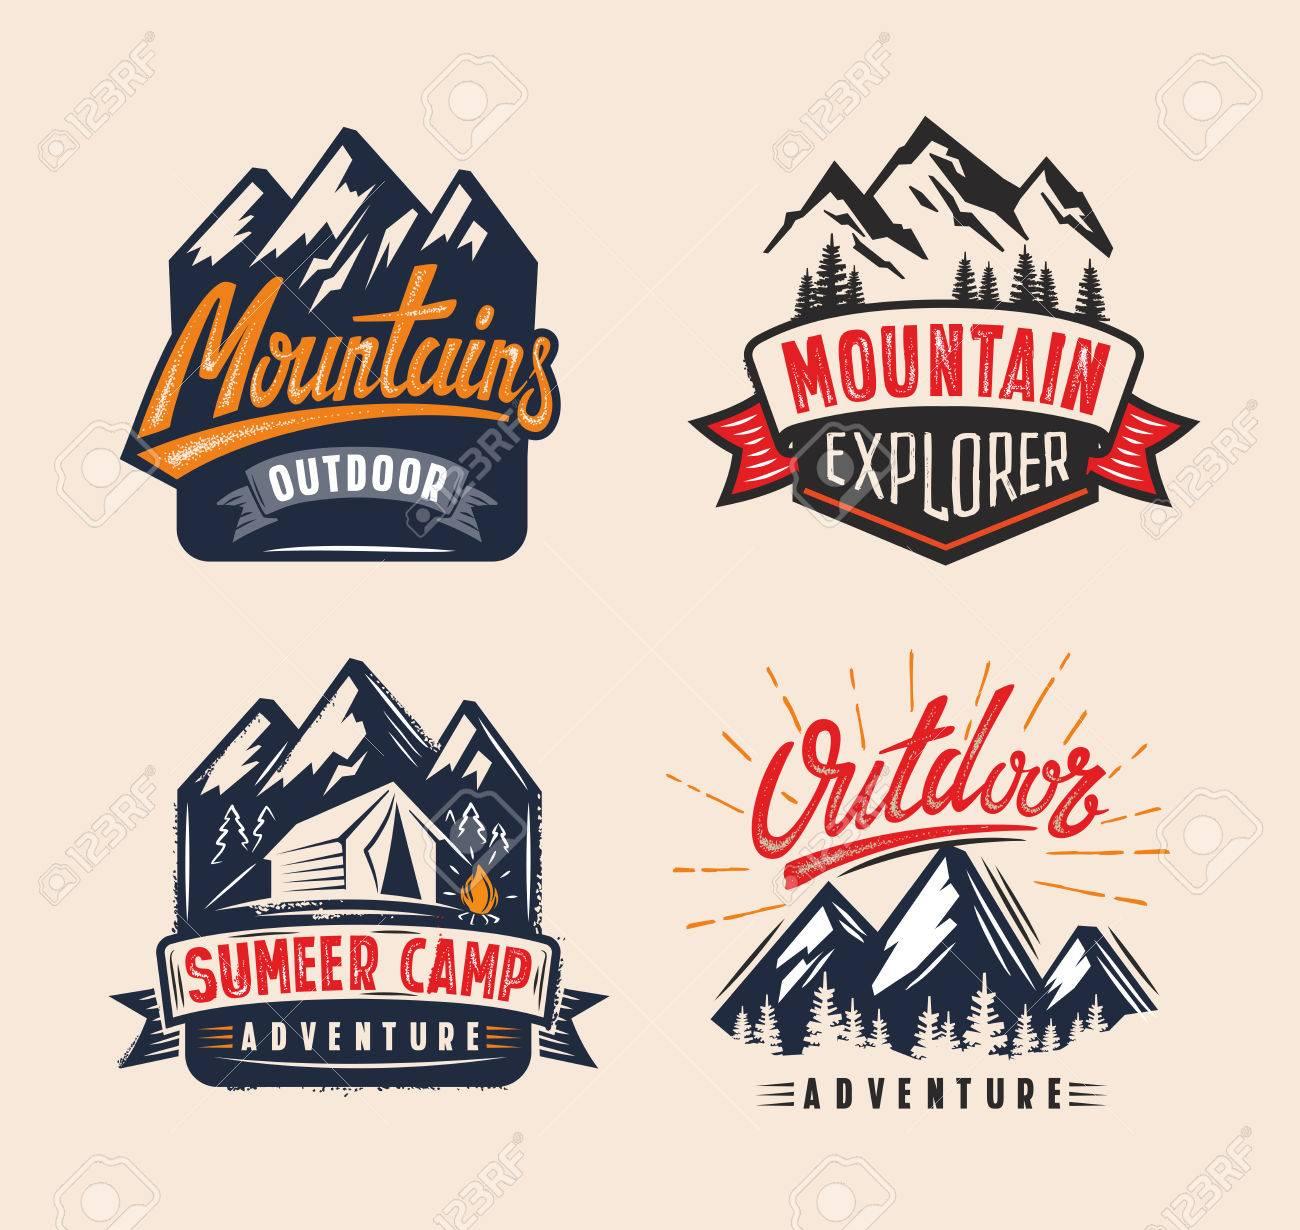 vector Adventure vintage on mountain badge - 62282872